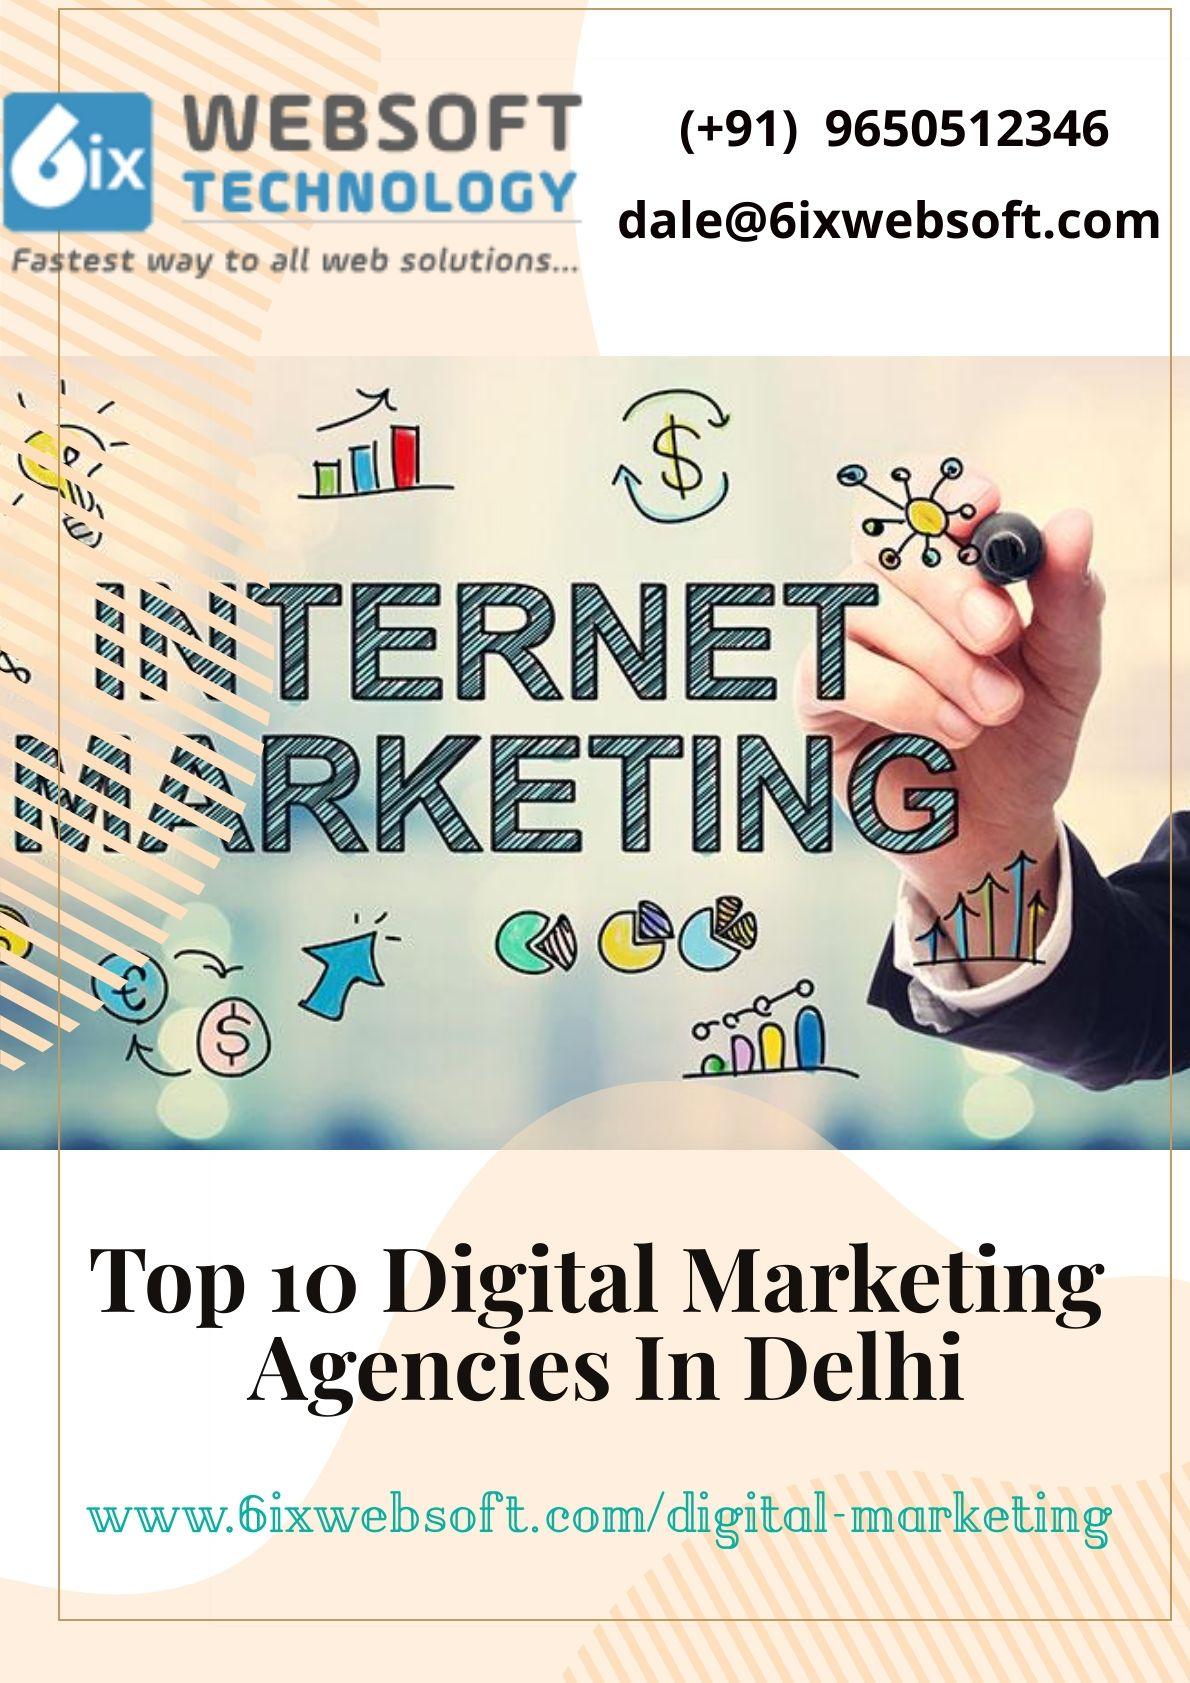 Top 10 Digital Marketing Agencies In Delhi Digital Marketing Agency Online Marketing Agency Digital Marketing